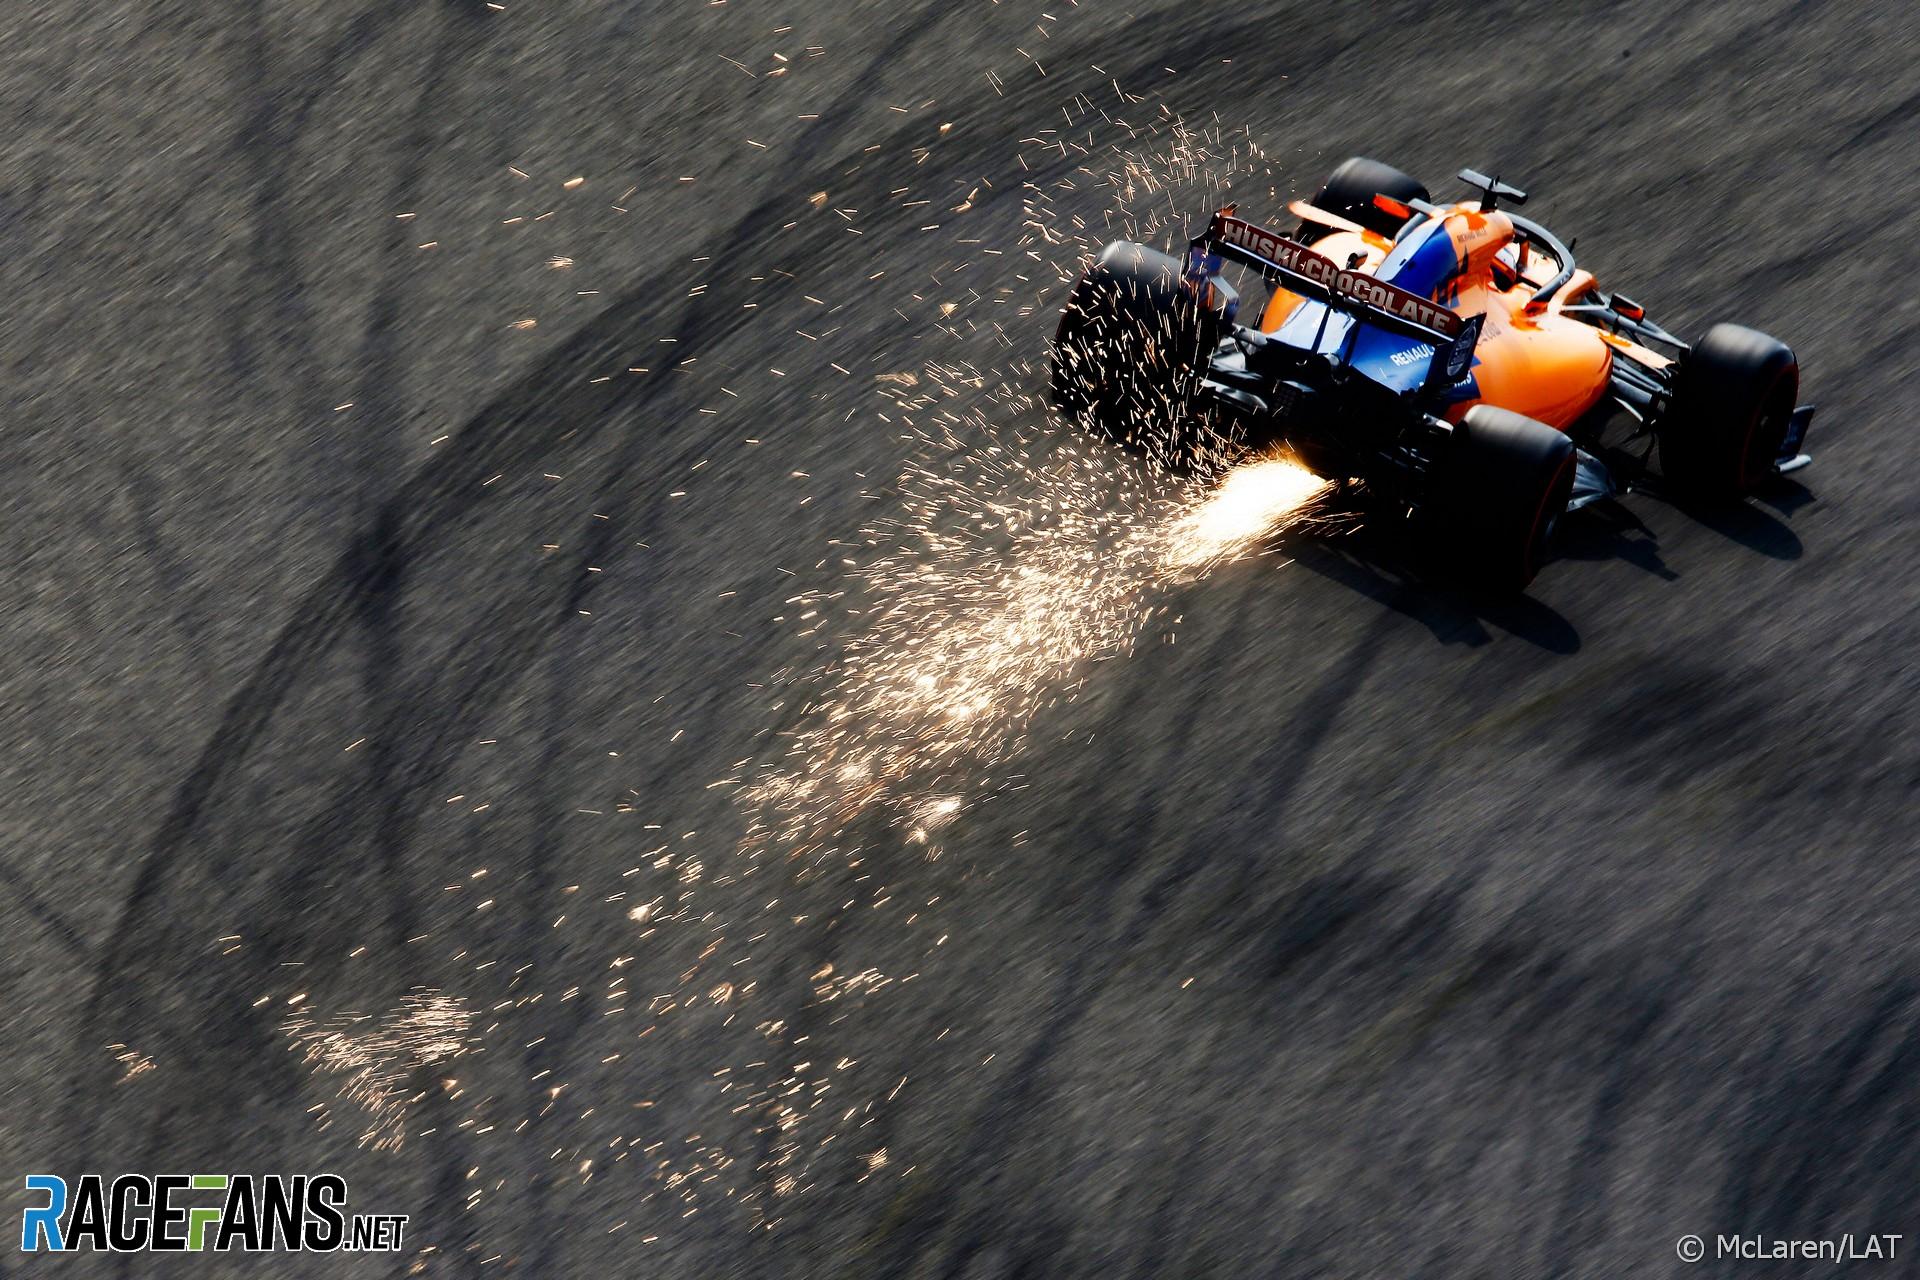 Carlos Sainz Jnr, McLaren, Shanghai International Circuit, 2019